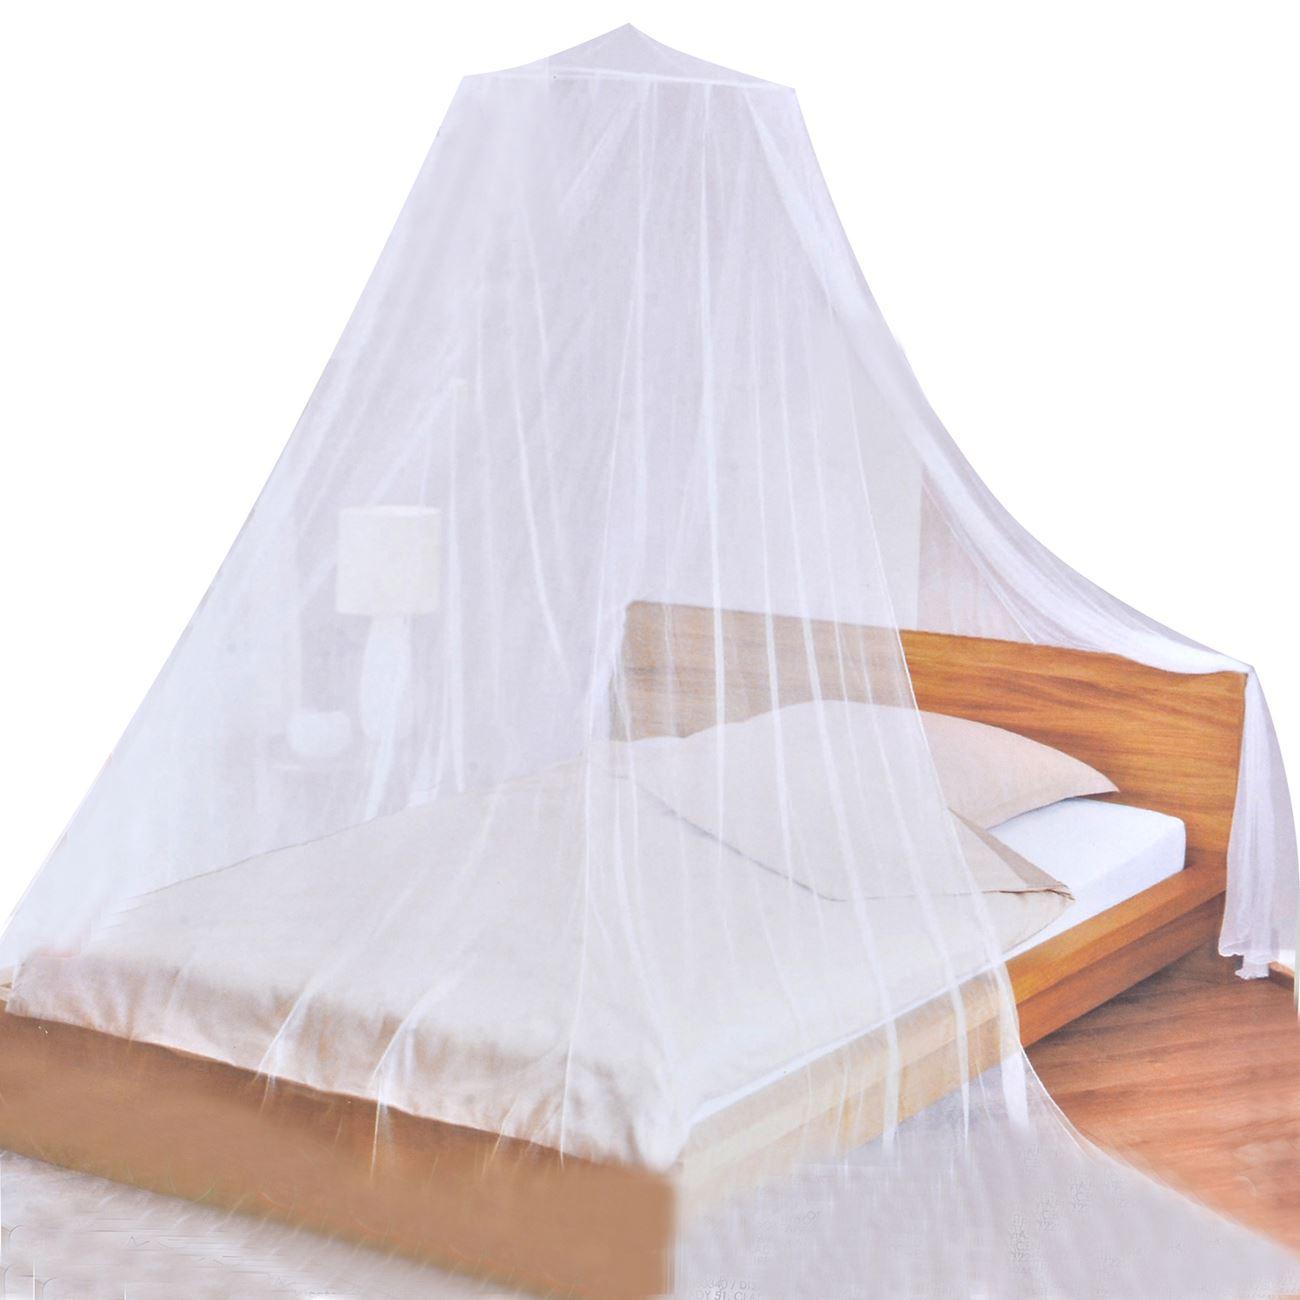 d524caeece6 Κουνουπιέρα Διπλού Κρεβατιού Οροφής Λευκή 2.5 m < Κουνουπιέρες Οροφής    Jumbo